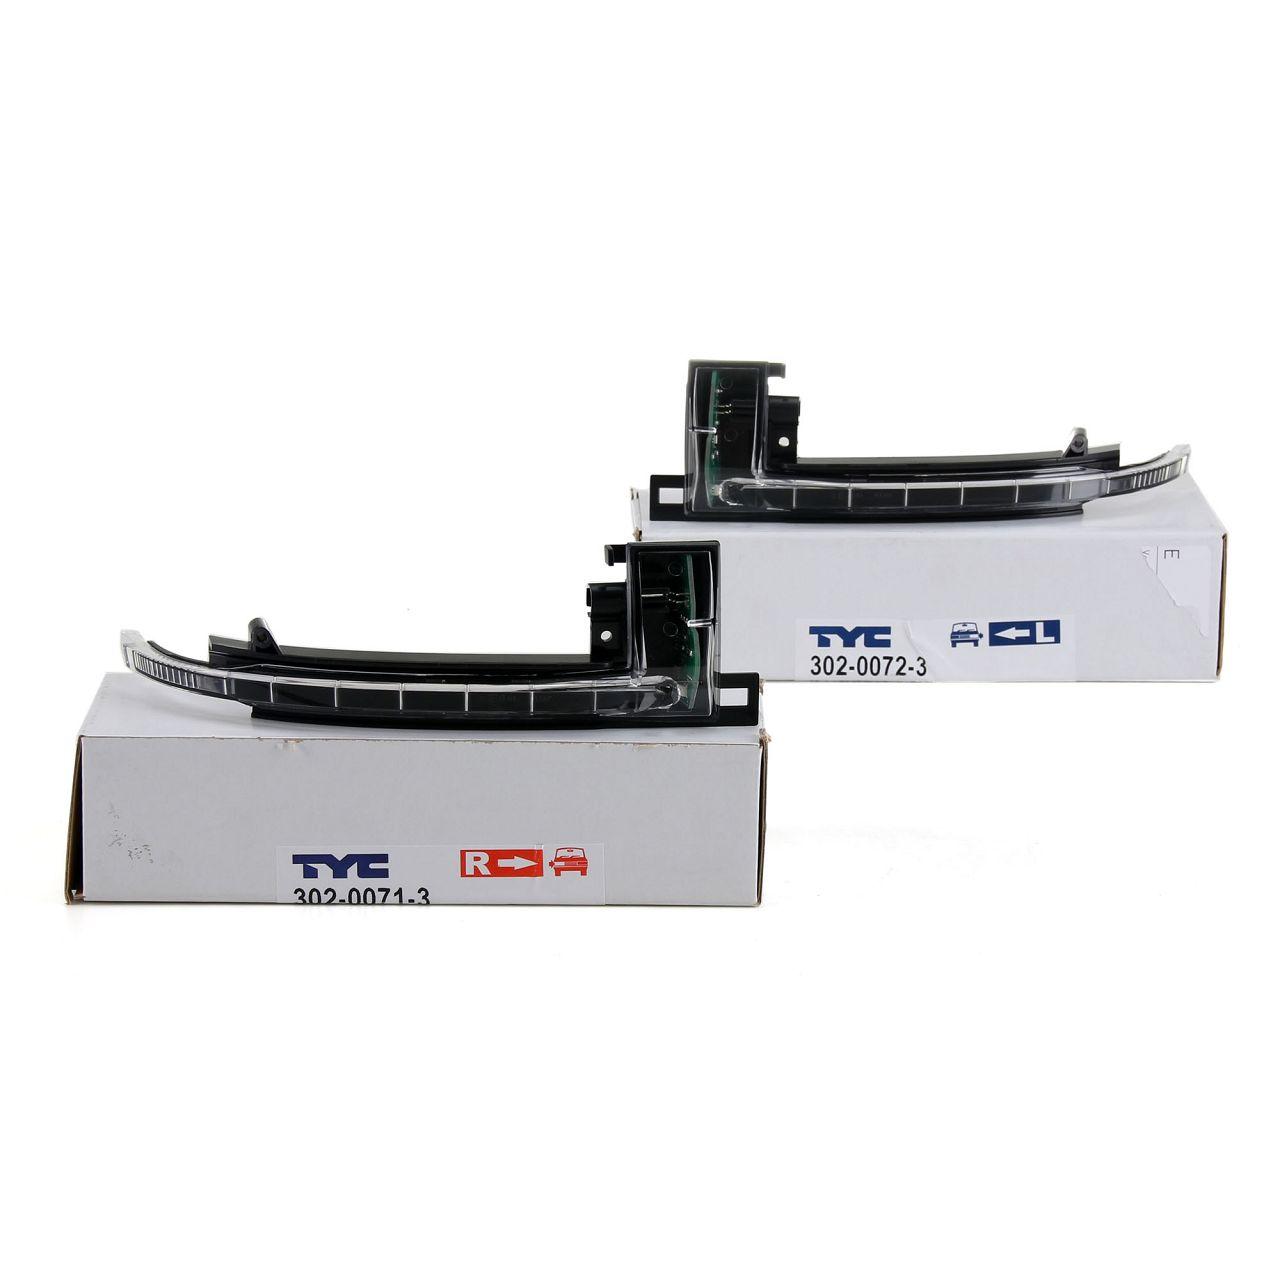 2x TYC Blinkleuchte Außenspiegel LED für AUDI A3 8P A4 B8 A5 8T A6 C6 A8 4E Q3